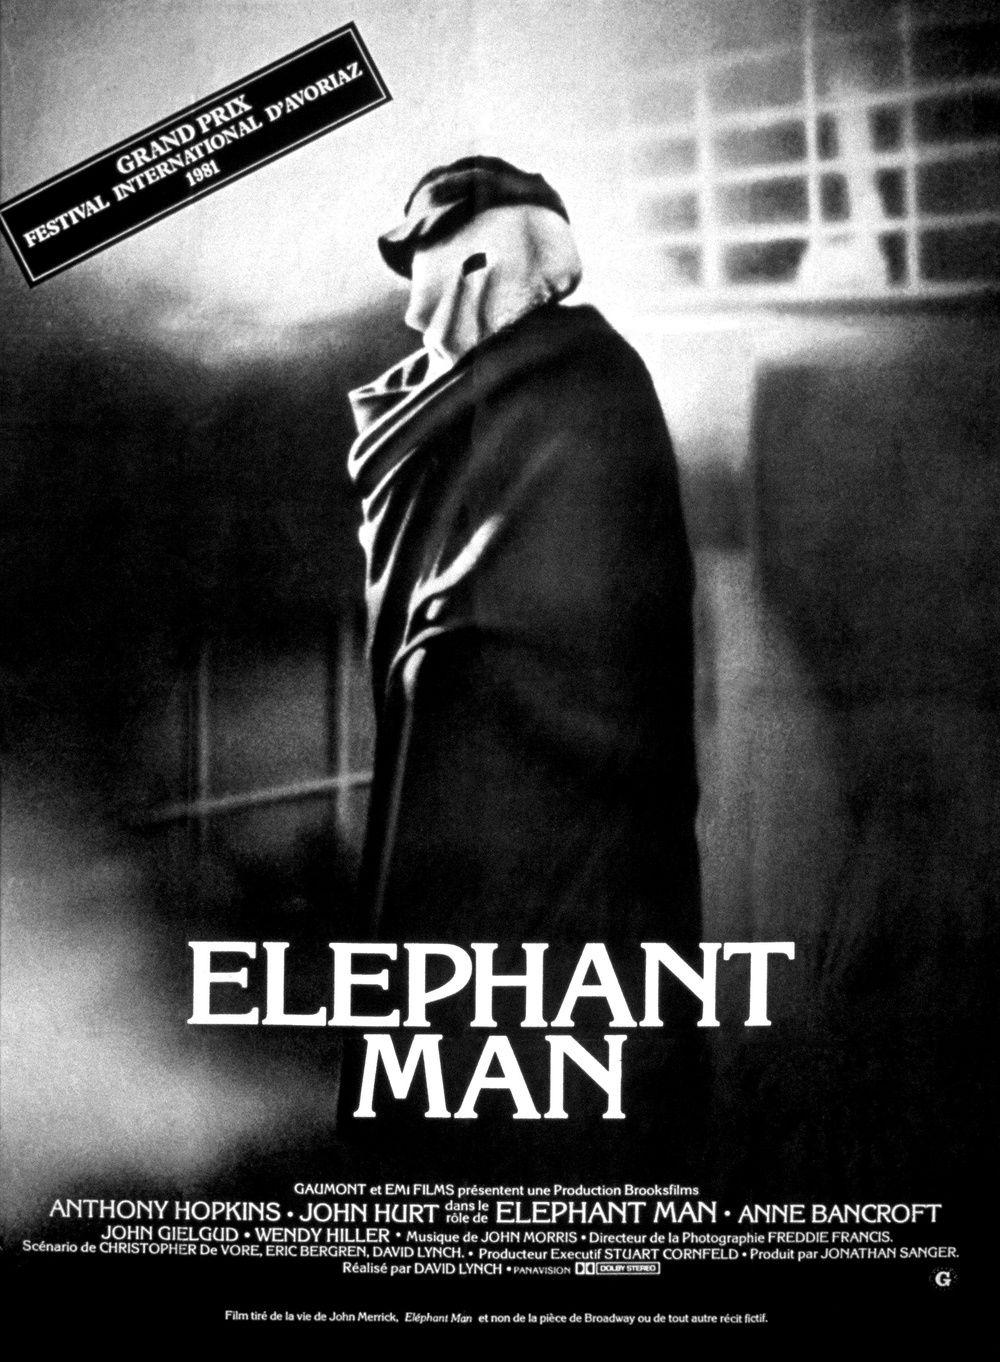 TCM Cinéma rend hommage mercredi à l'acteur John Hurt.